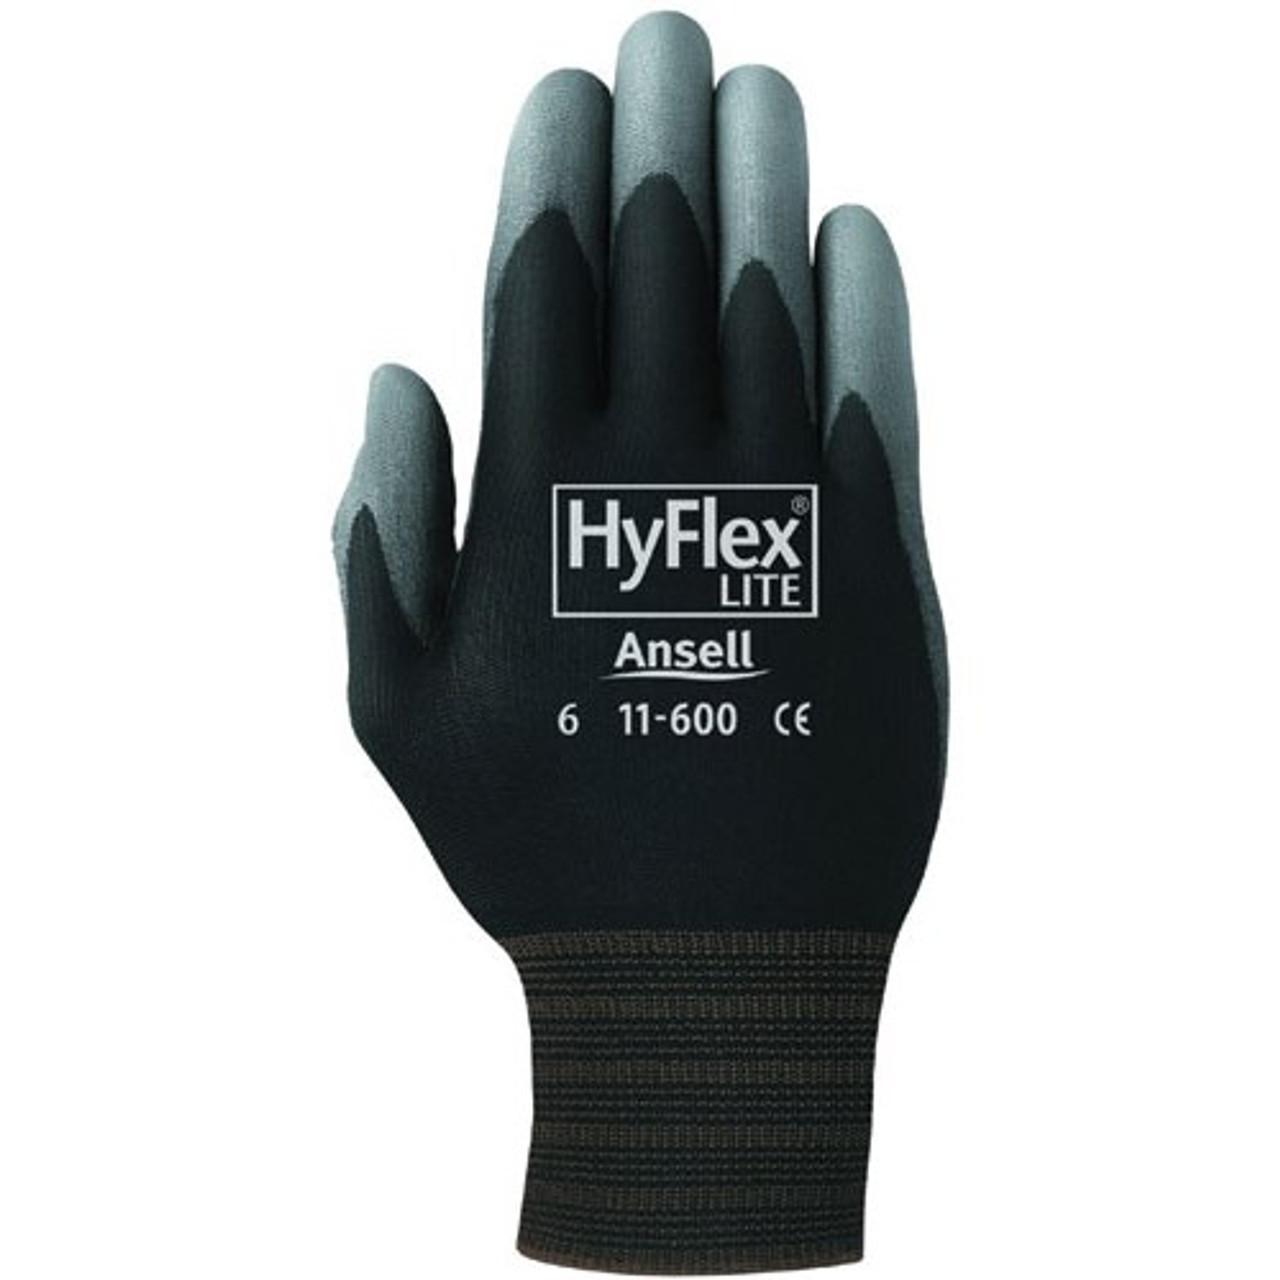 Hyflex Nitrile Dipped Gloves, Black